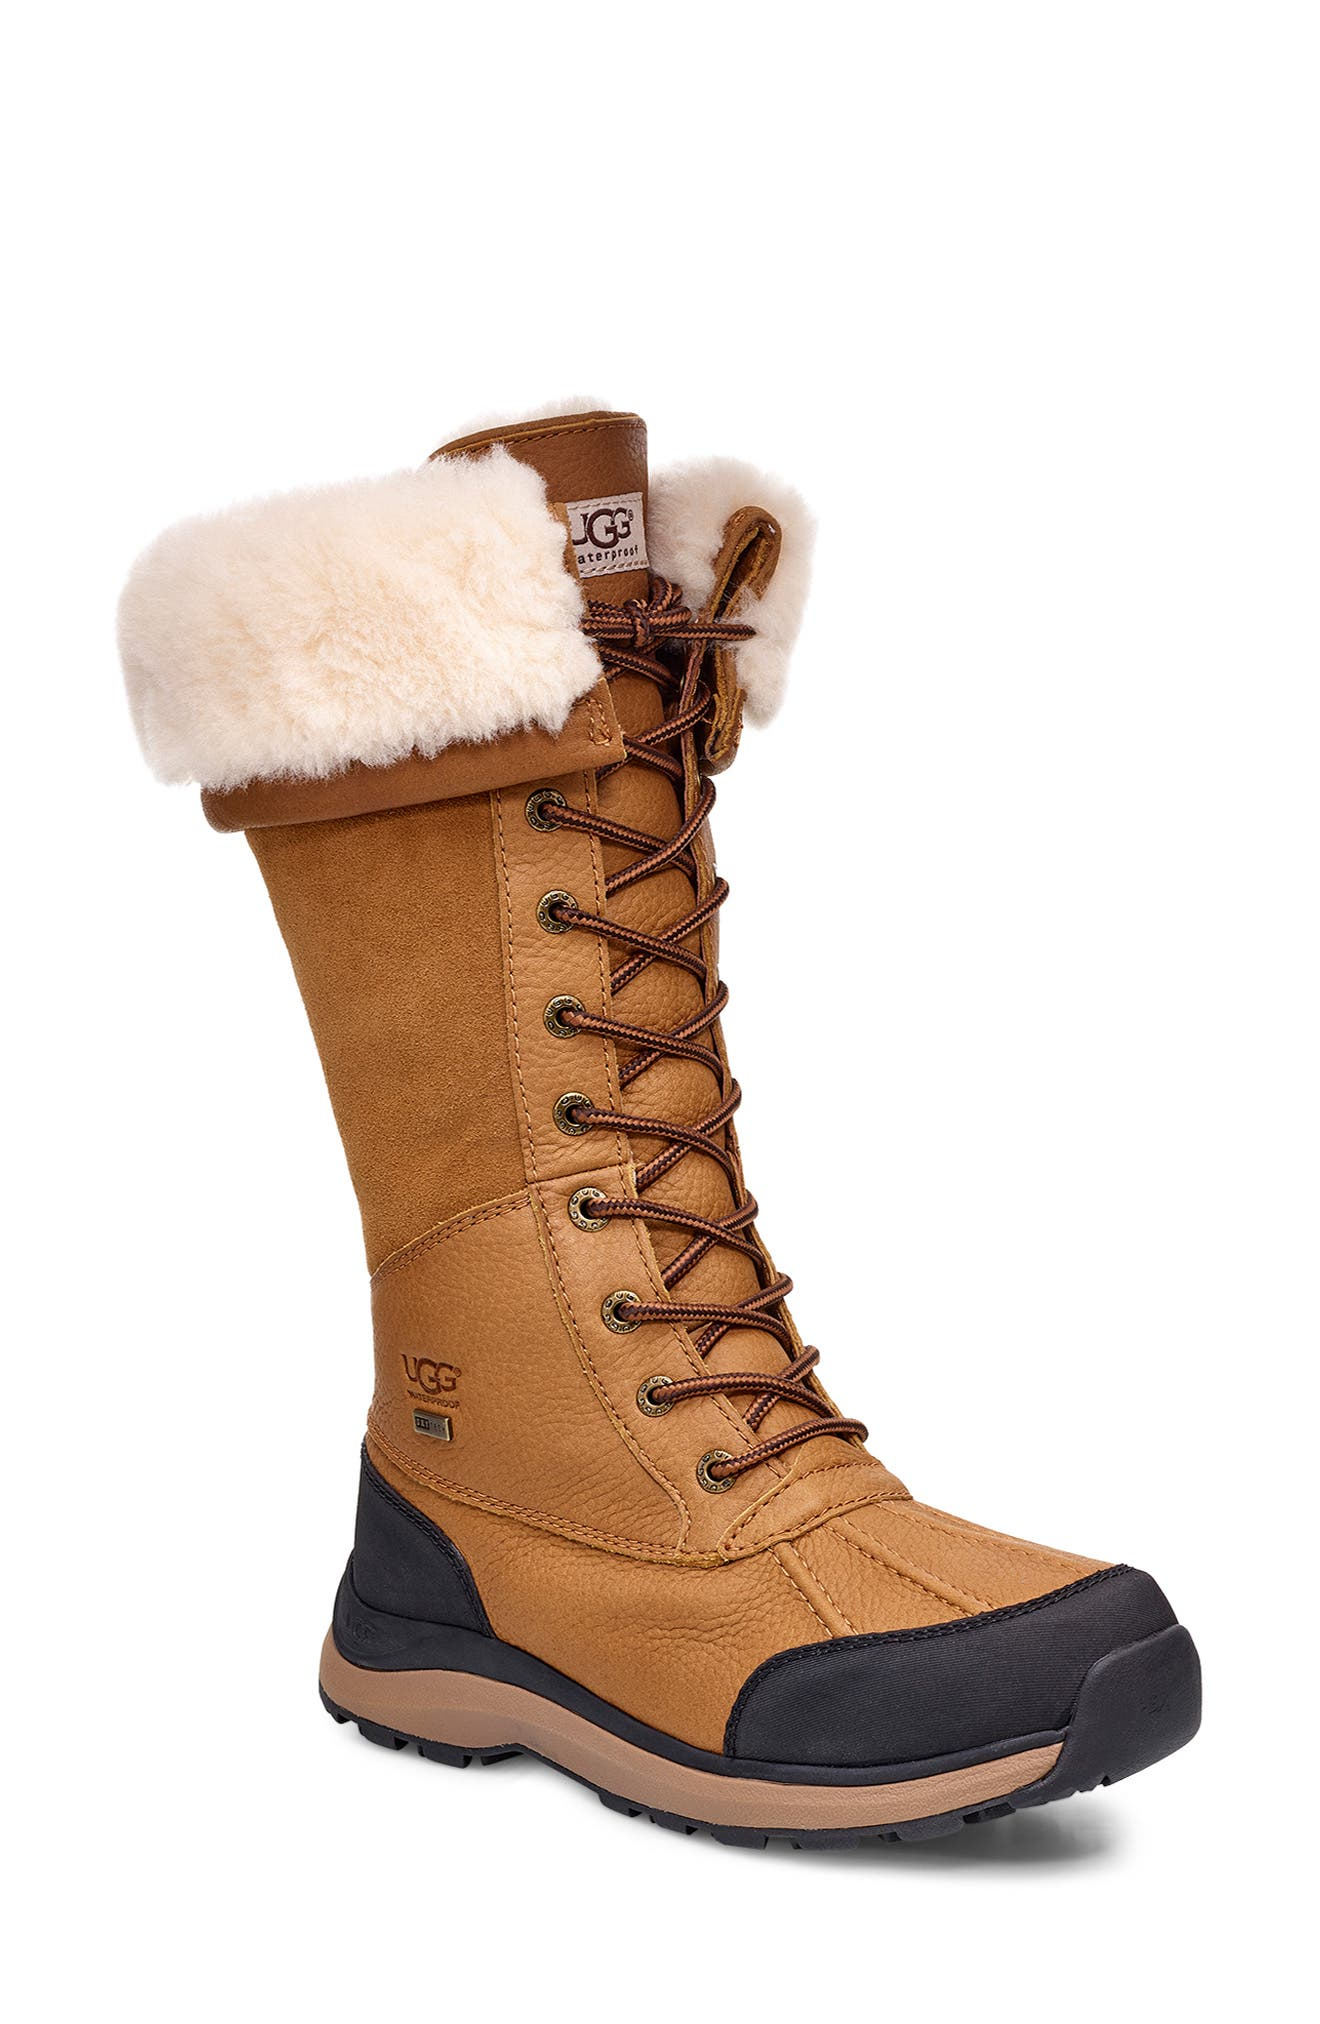 Adirondack II Waterproof Tall Boot,                         Main,                         color, CHESTNUT